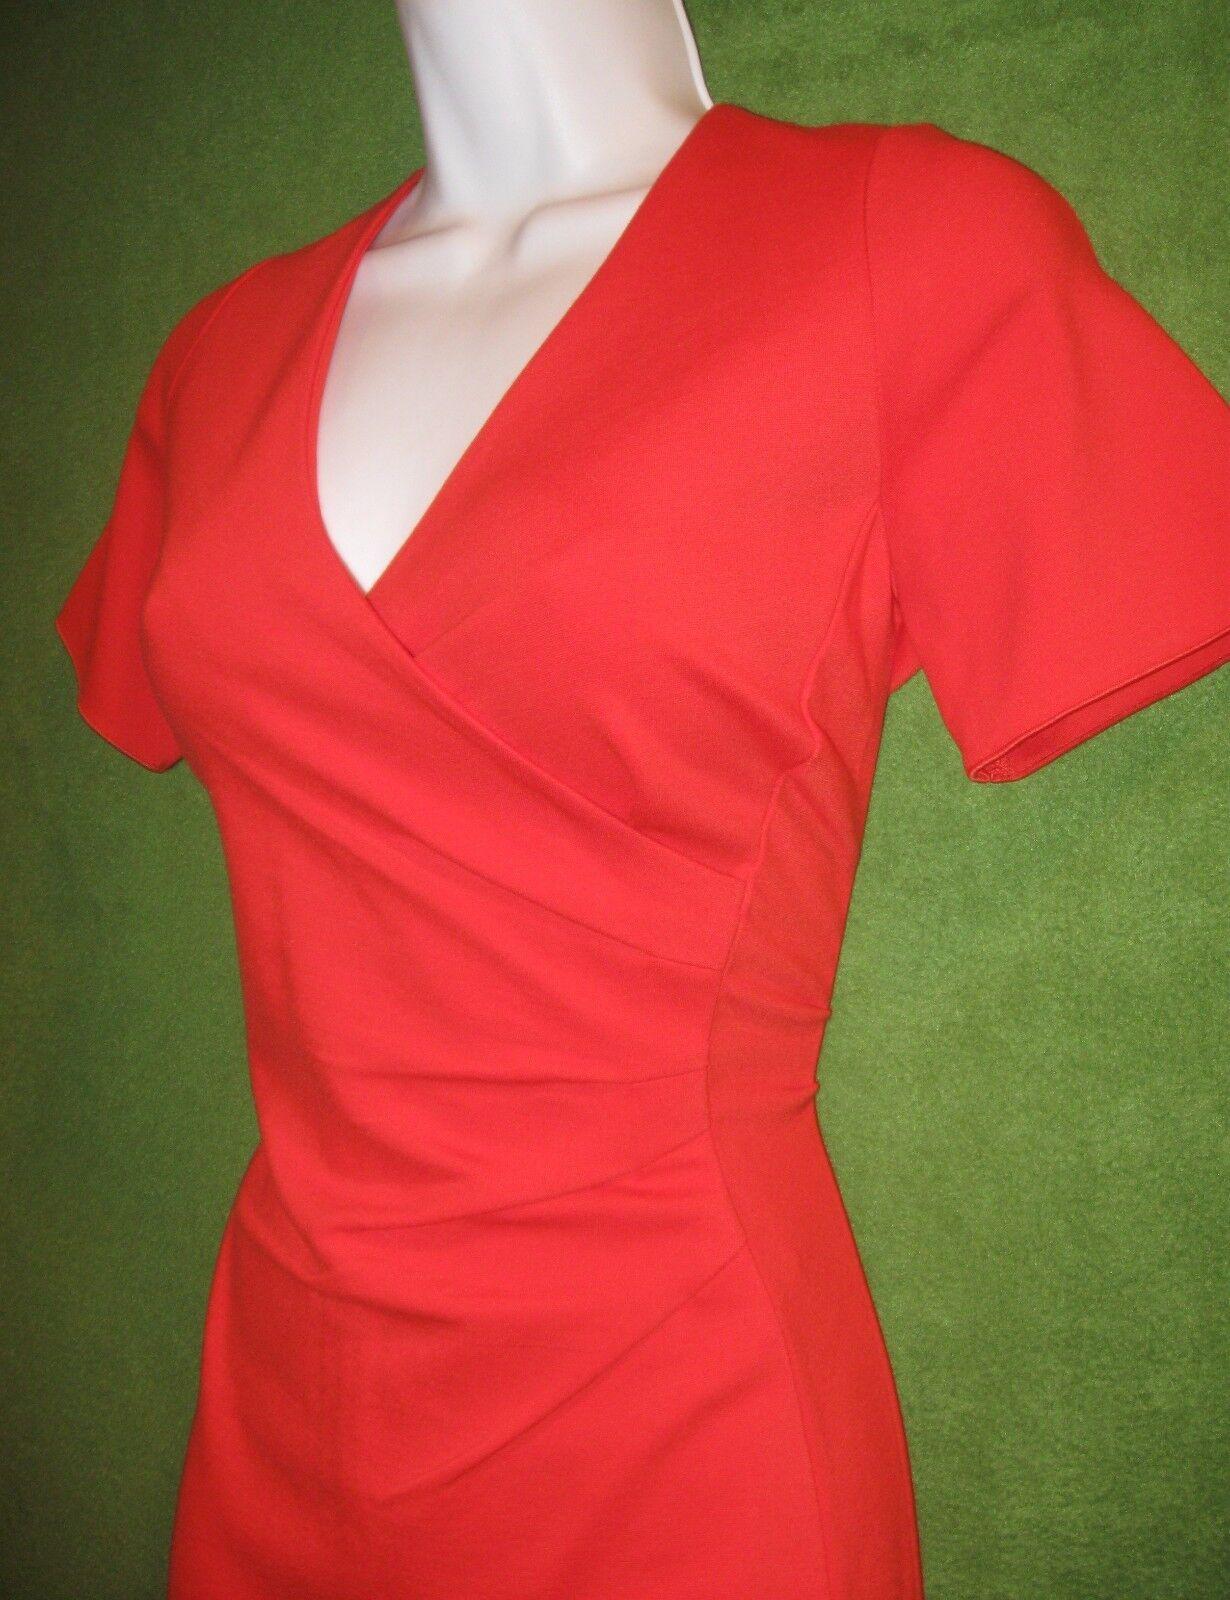 Lands Rojo Rojo Rojo Naranja Elastizado Imitación-End Envoltura Ponte Vestido informal social de trabajo 12  75 e8739e